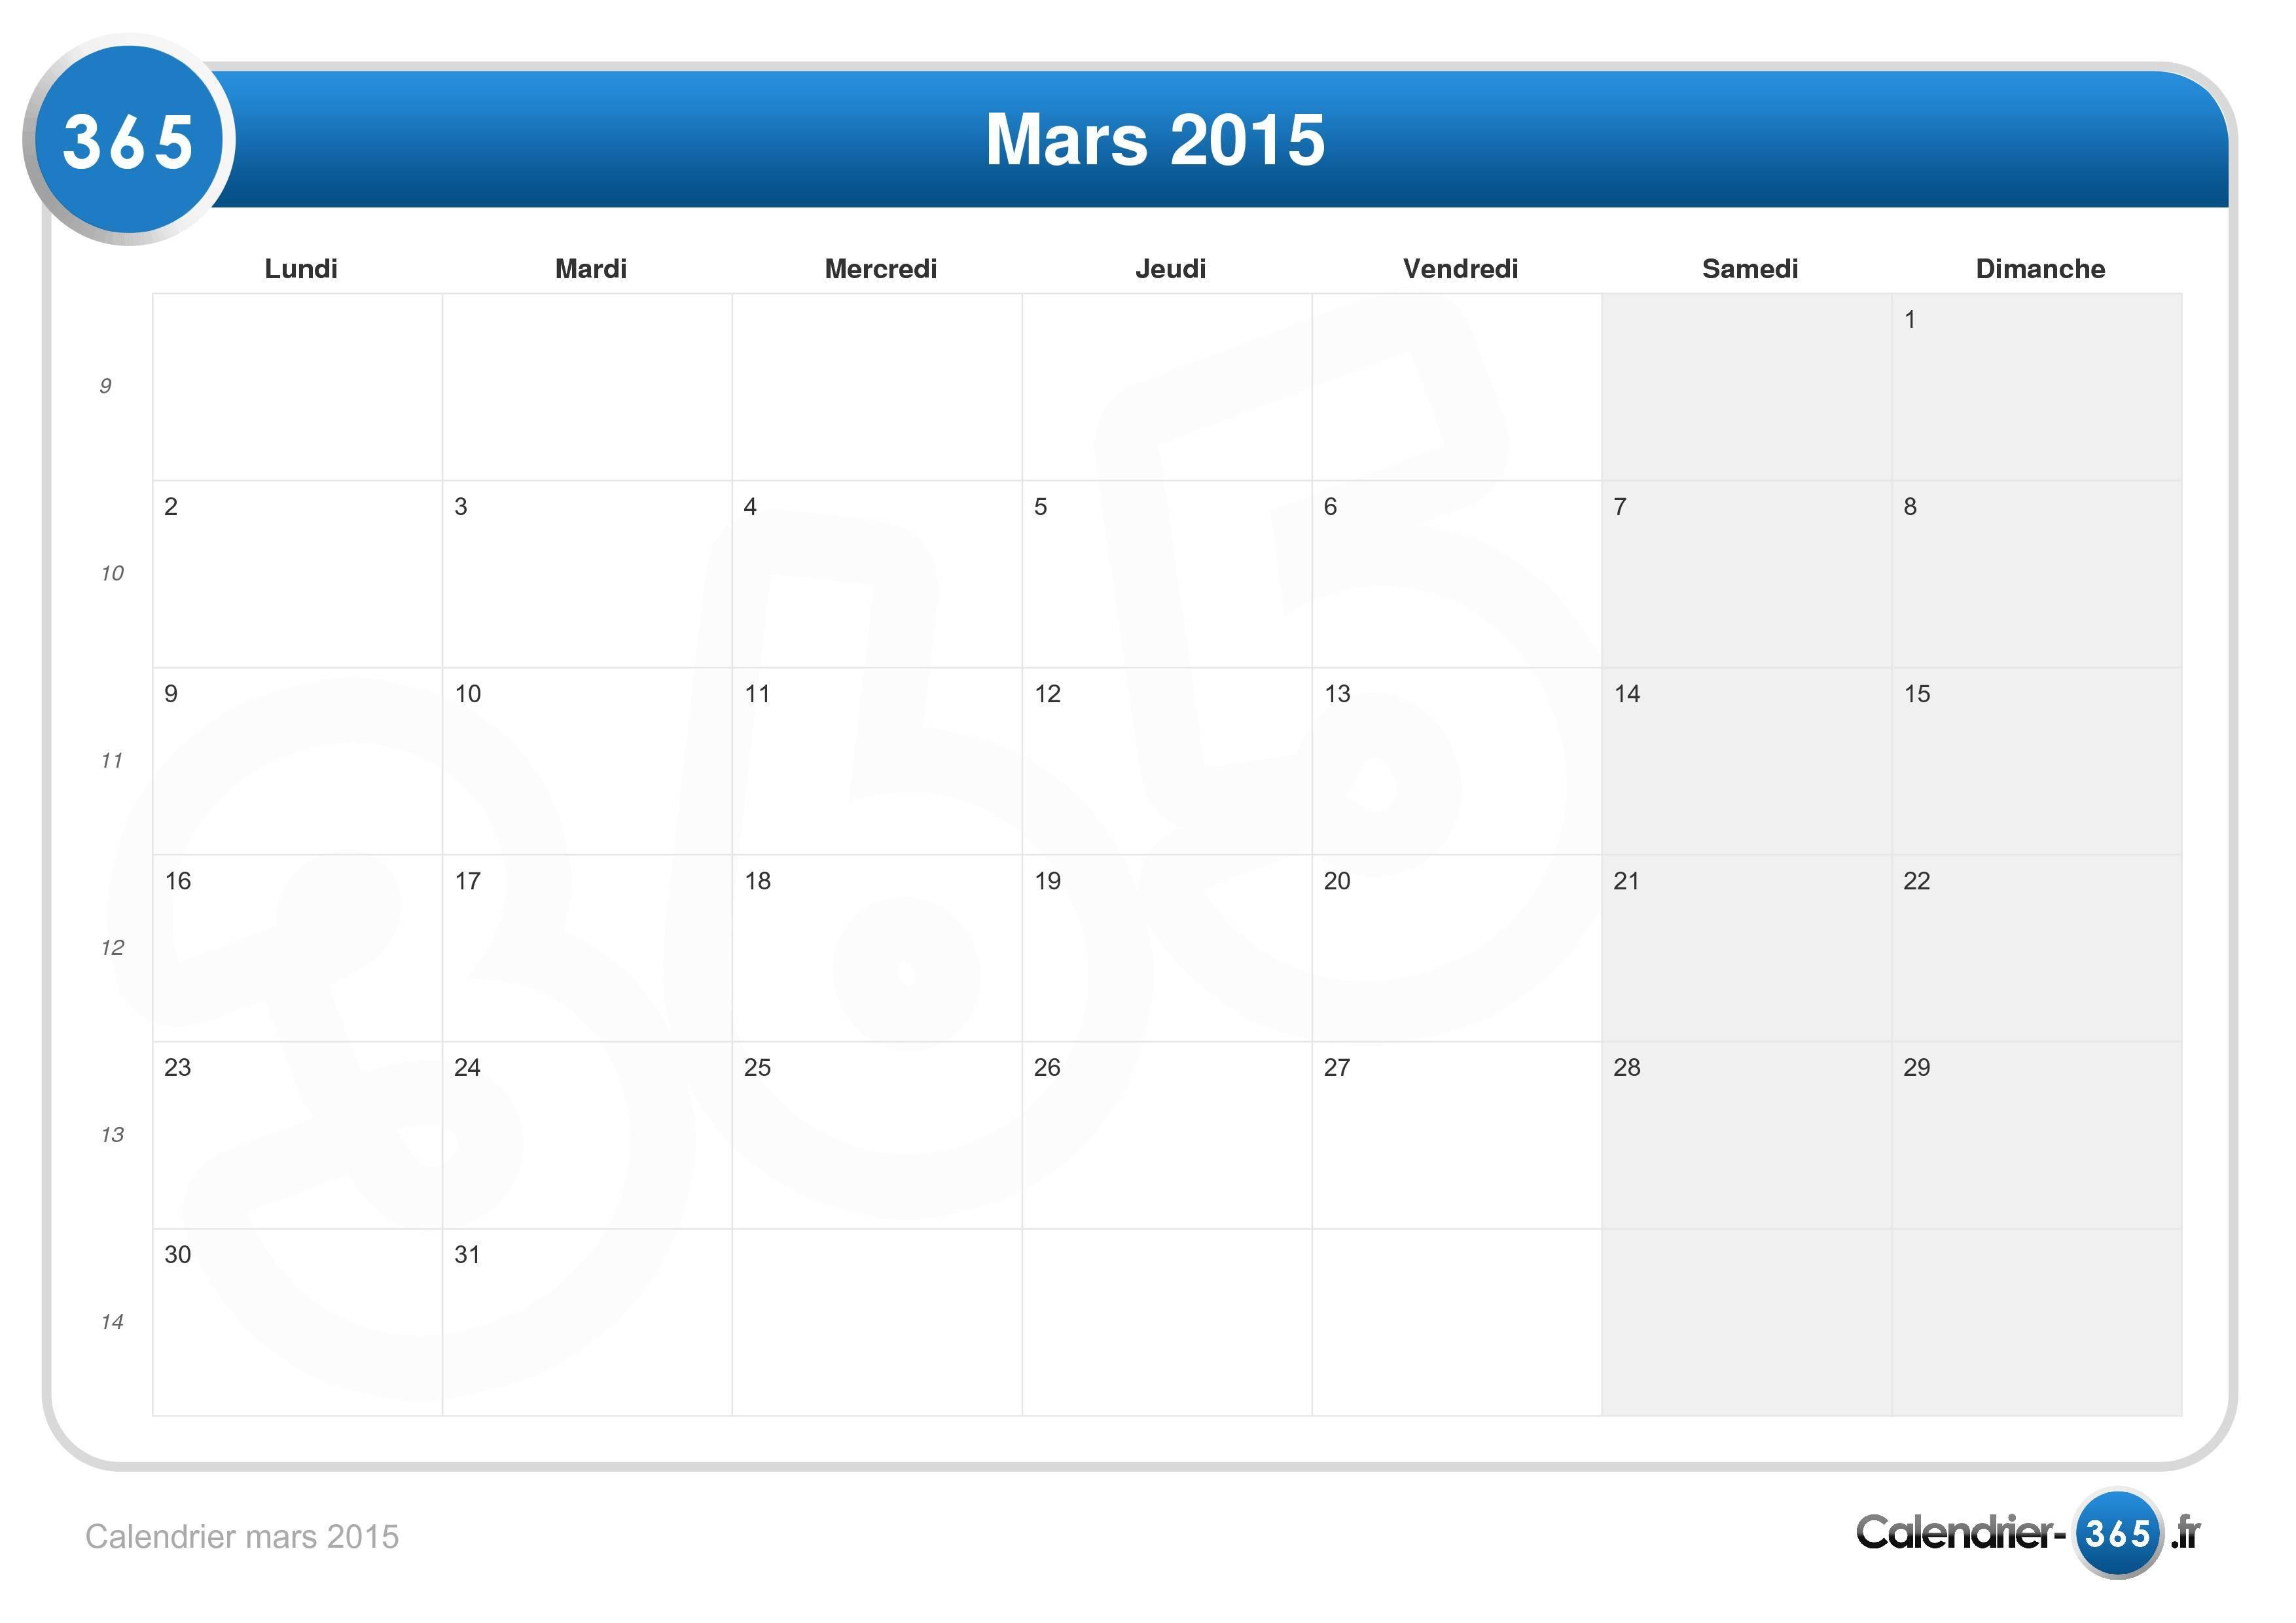 Calendrier Maree Biarritz.Pour Ma Famille Horaires Des Marees Biarritz Mars 2015 Vacances